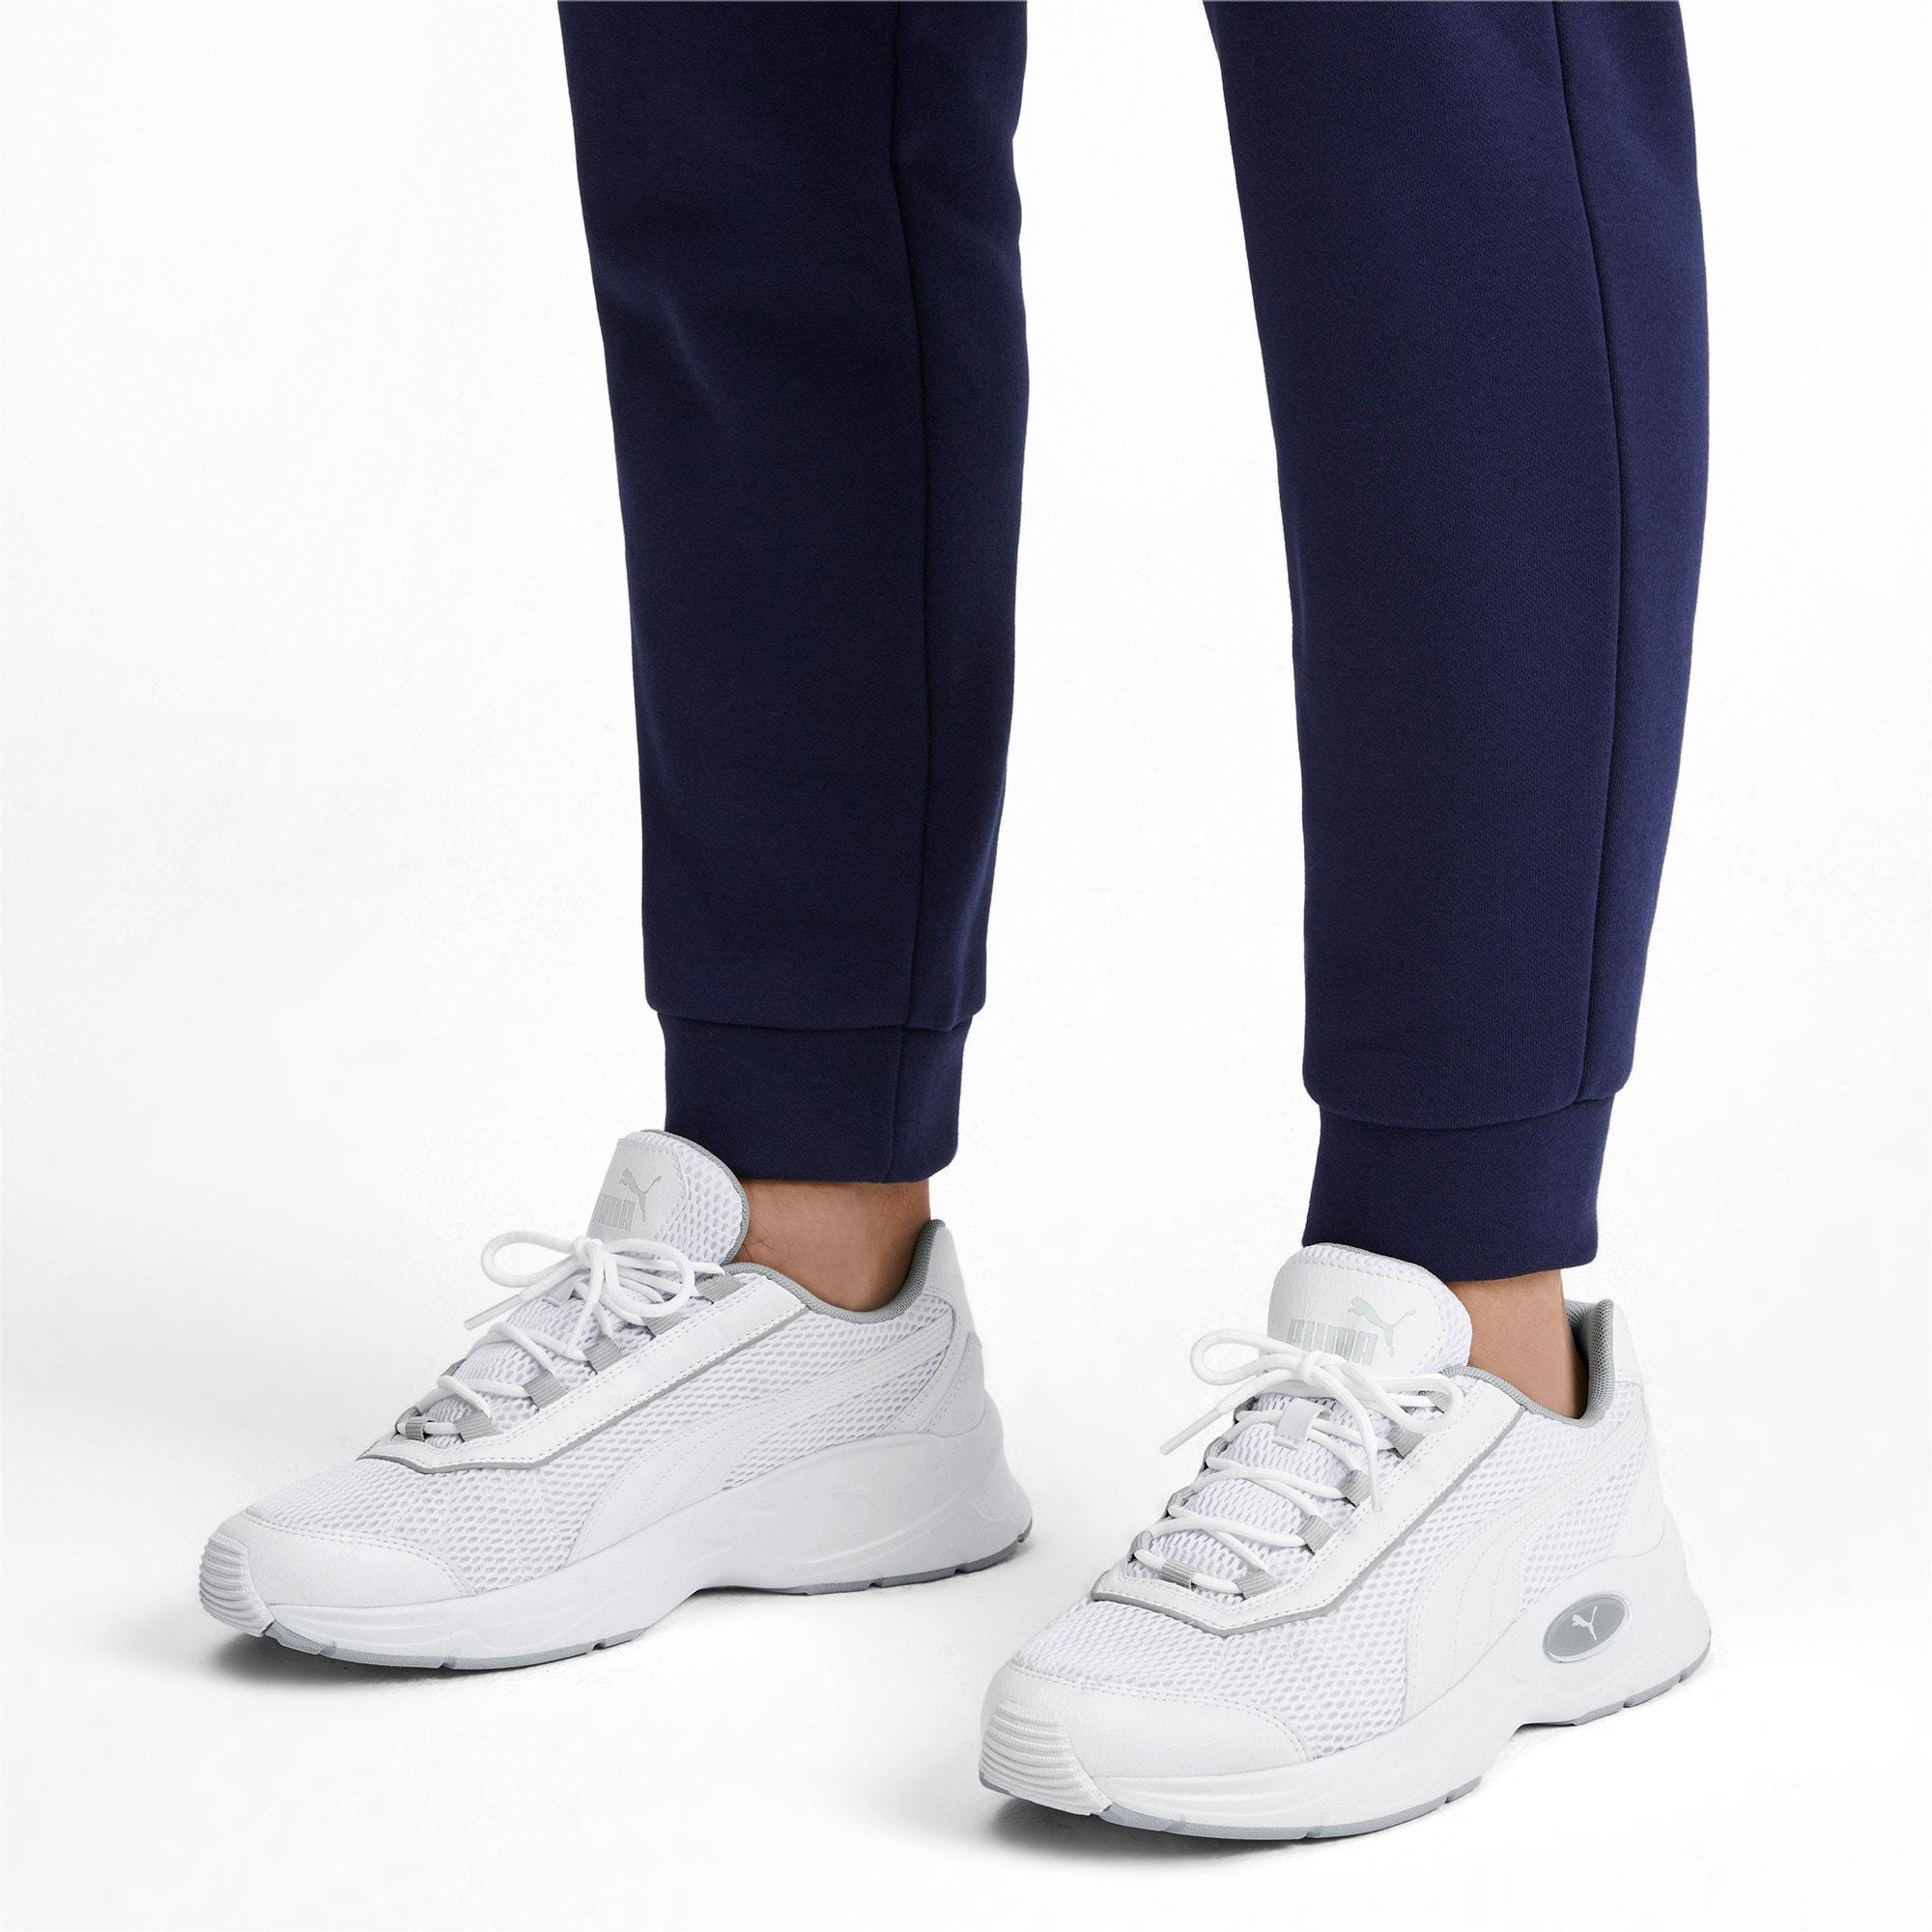 Thumbnail 2 of Nucleus Training Shoes, Puma White-High Rise, medium